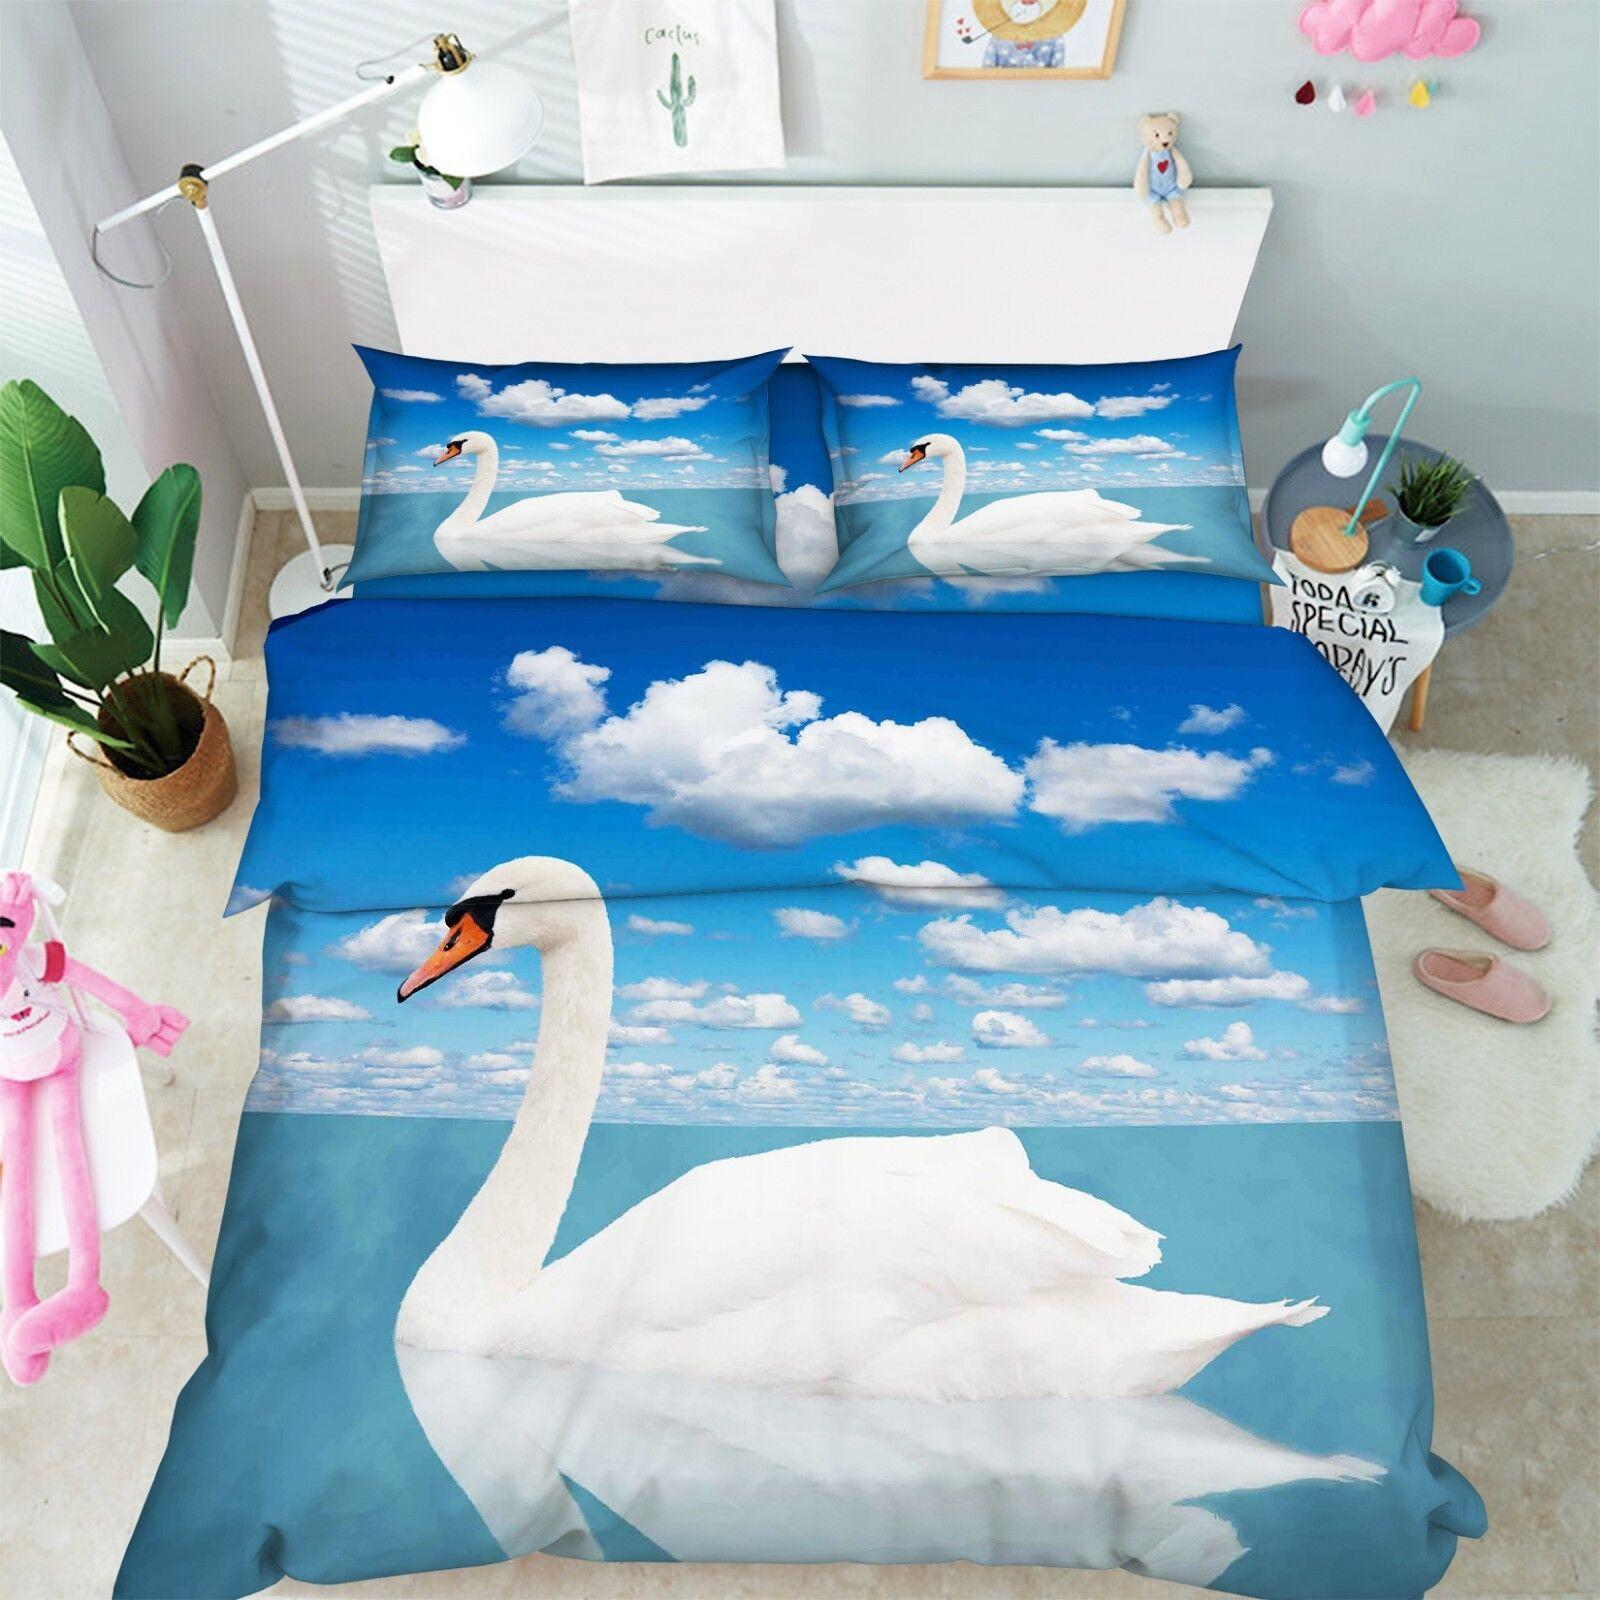 3D Sky Swan Lake 887 Bed Pillowcases Quilt Duvet Cover Set Single Queen King CA